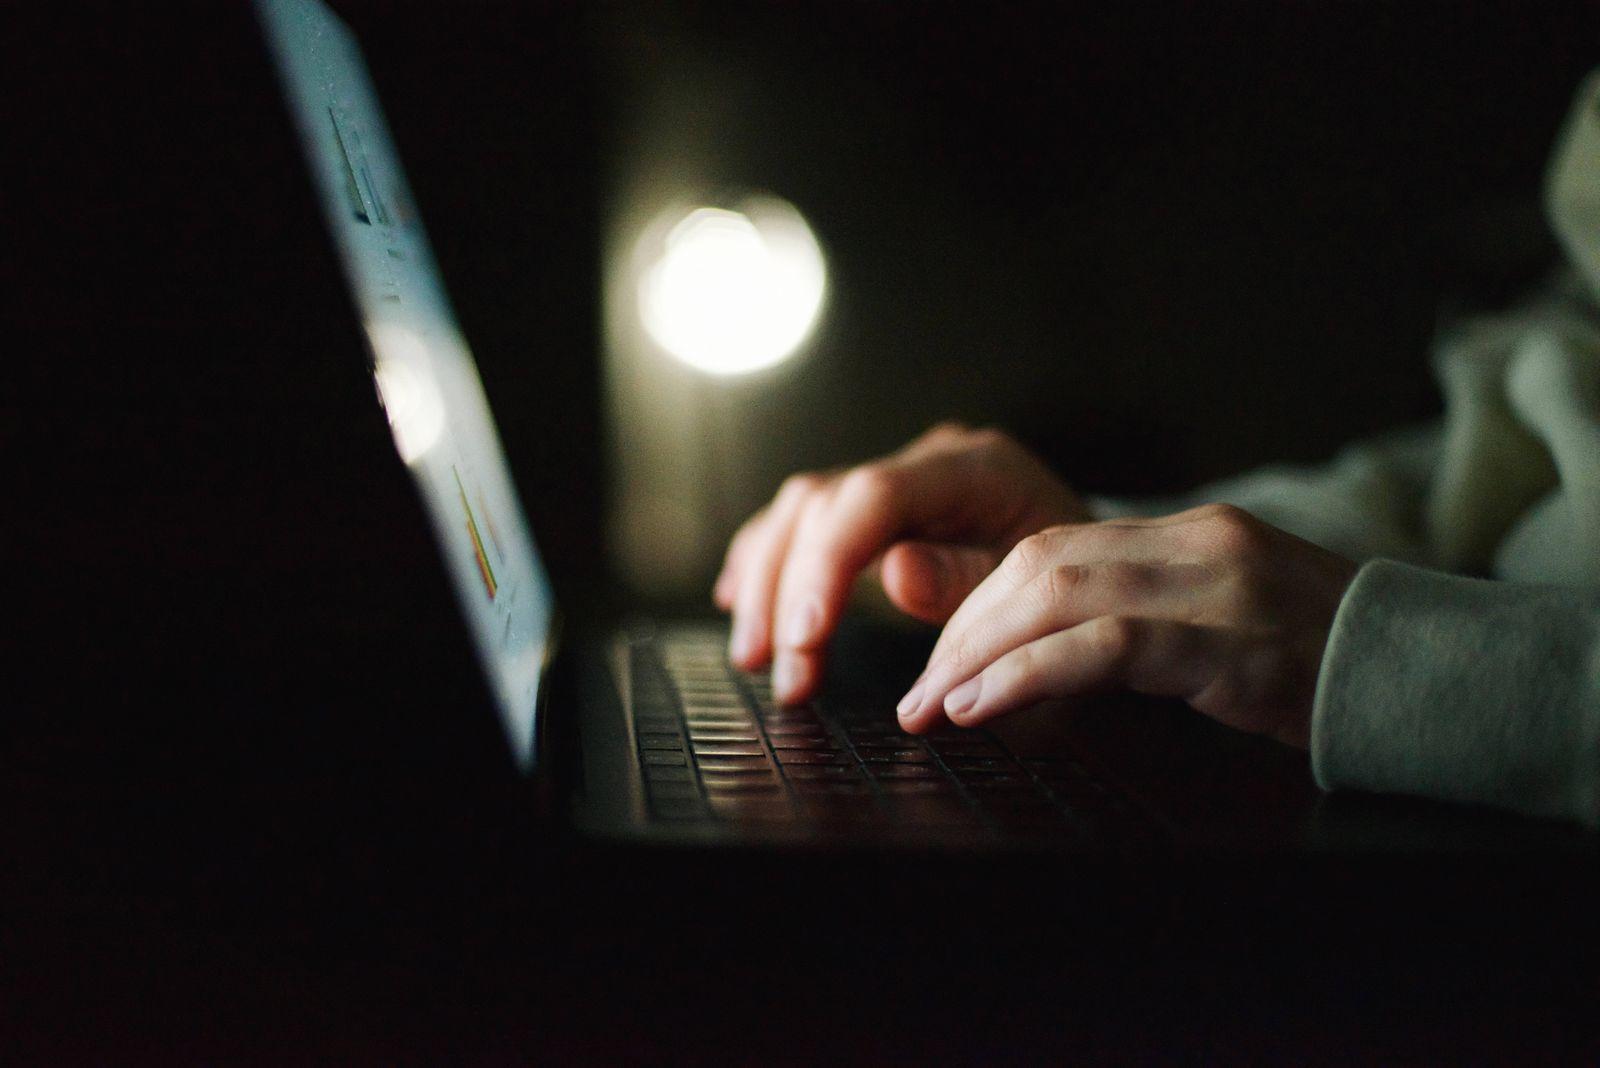 Anonymous woman working on laptop at night Kyiv, Kyiv City, Ukraine PUBLICATIONxINxGERxSUIxAUTxONLY CR_INCH210304-668926